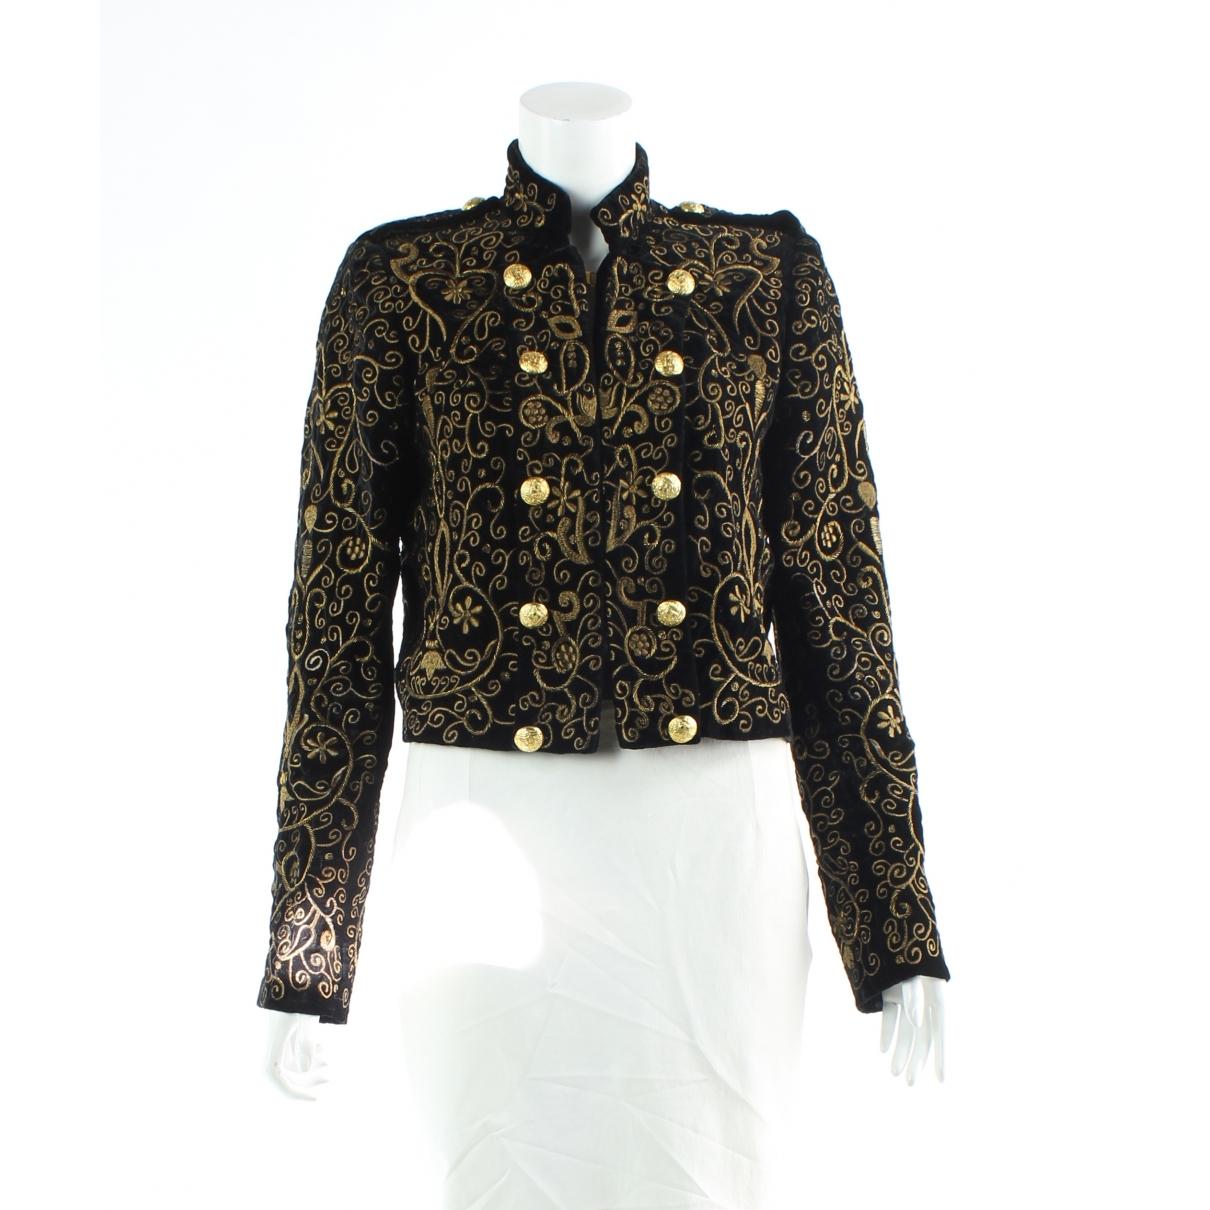 Alice & Olivia \N Black jacket for Women 8 US